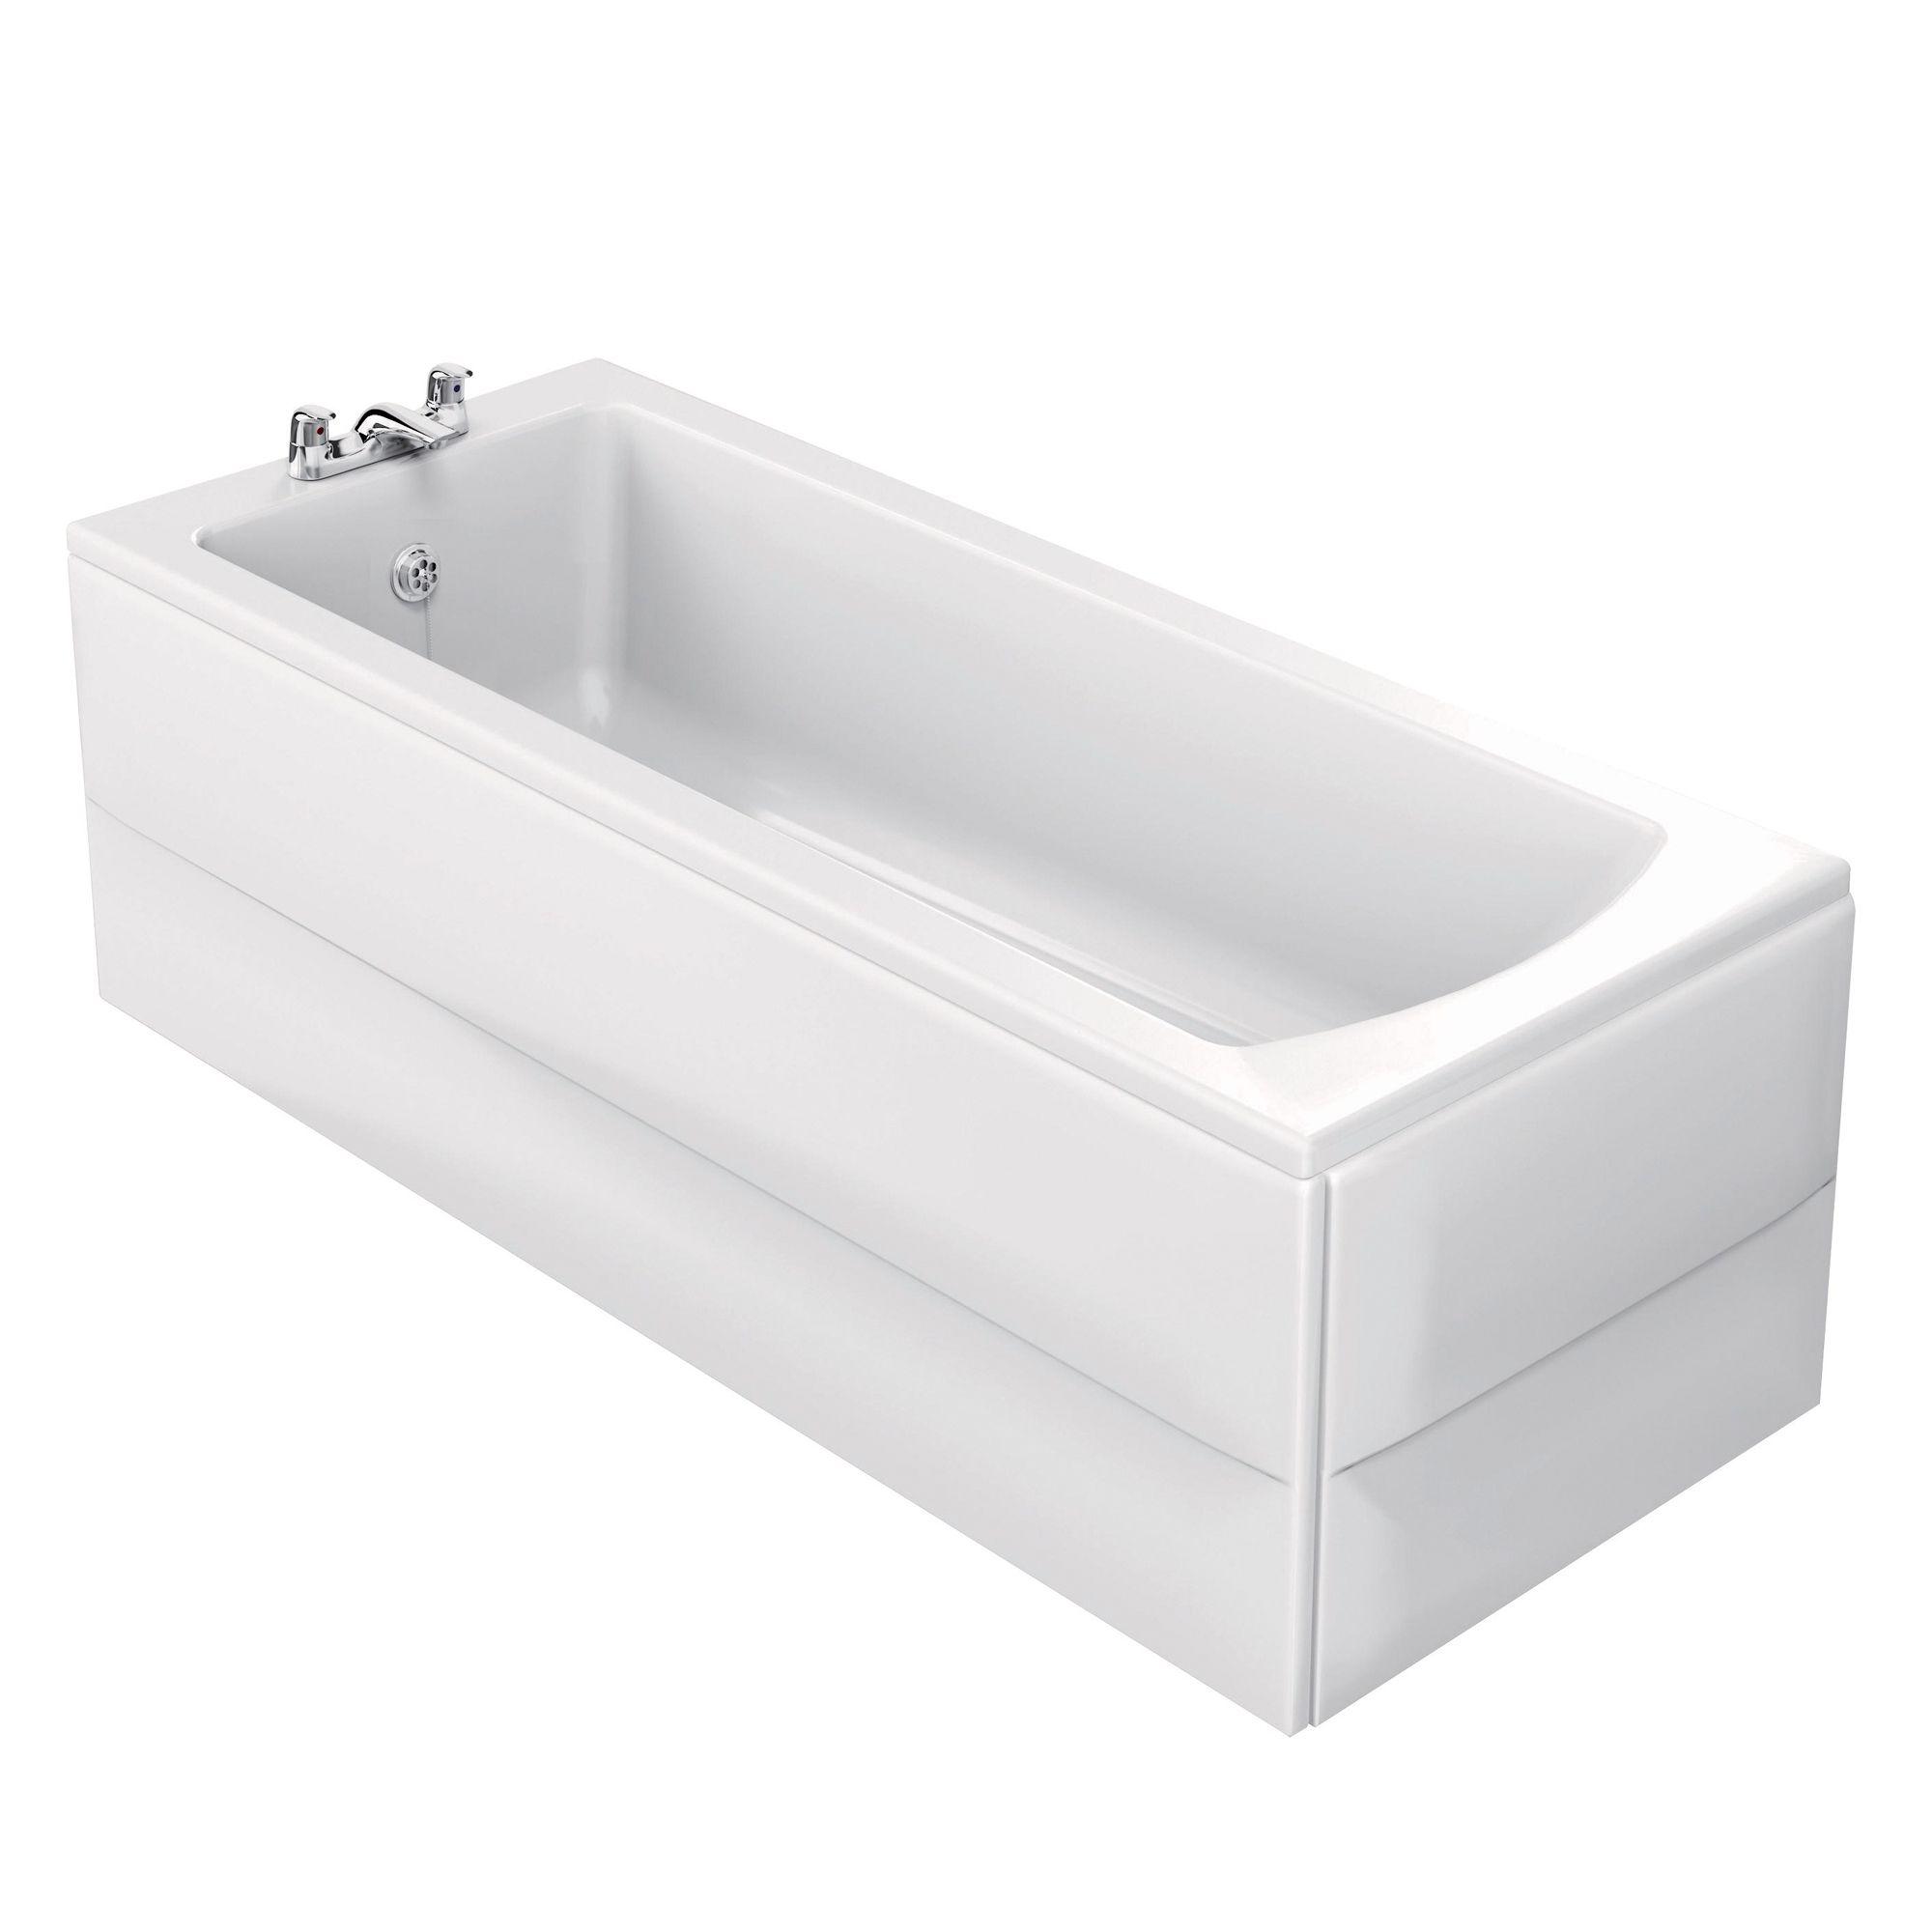 Ideal Standard Vue Acrylic Rectangular Straight Bath (L